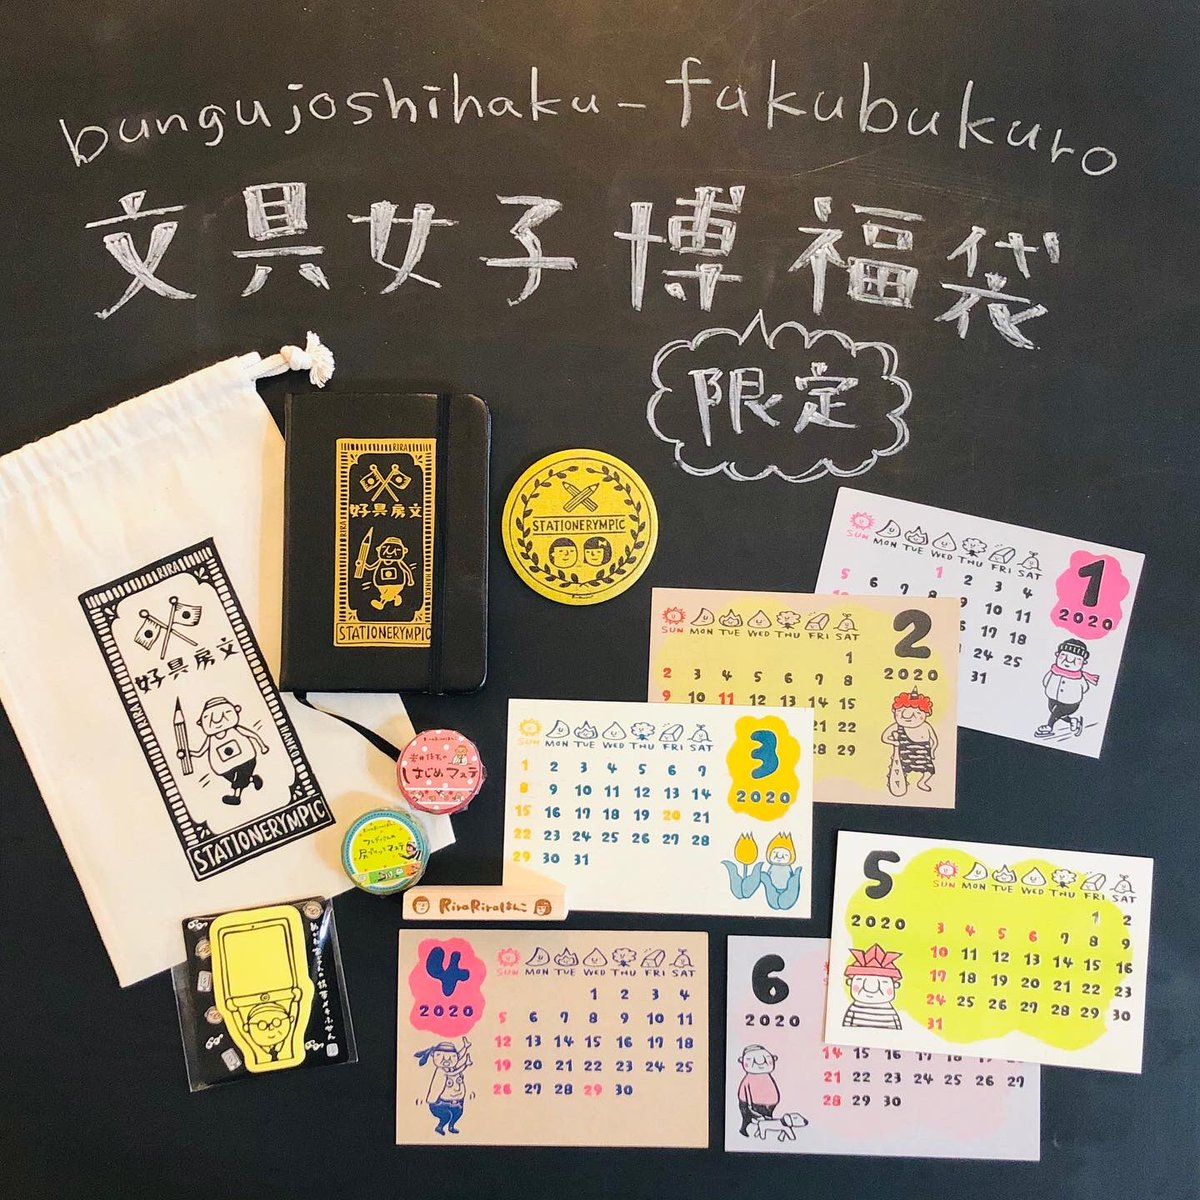 bungujoshi-fukubukuro-2020